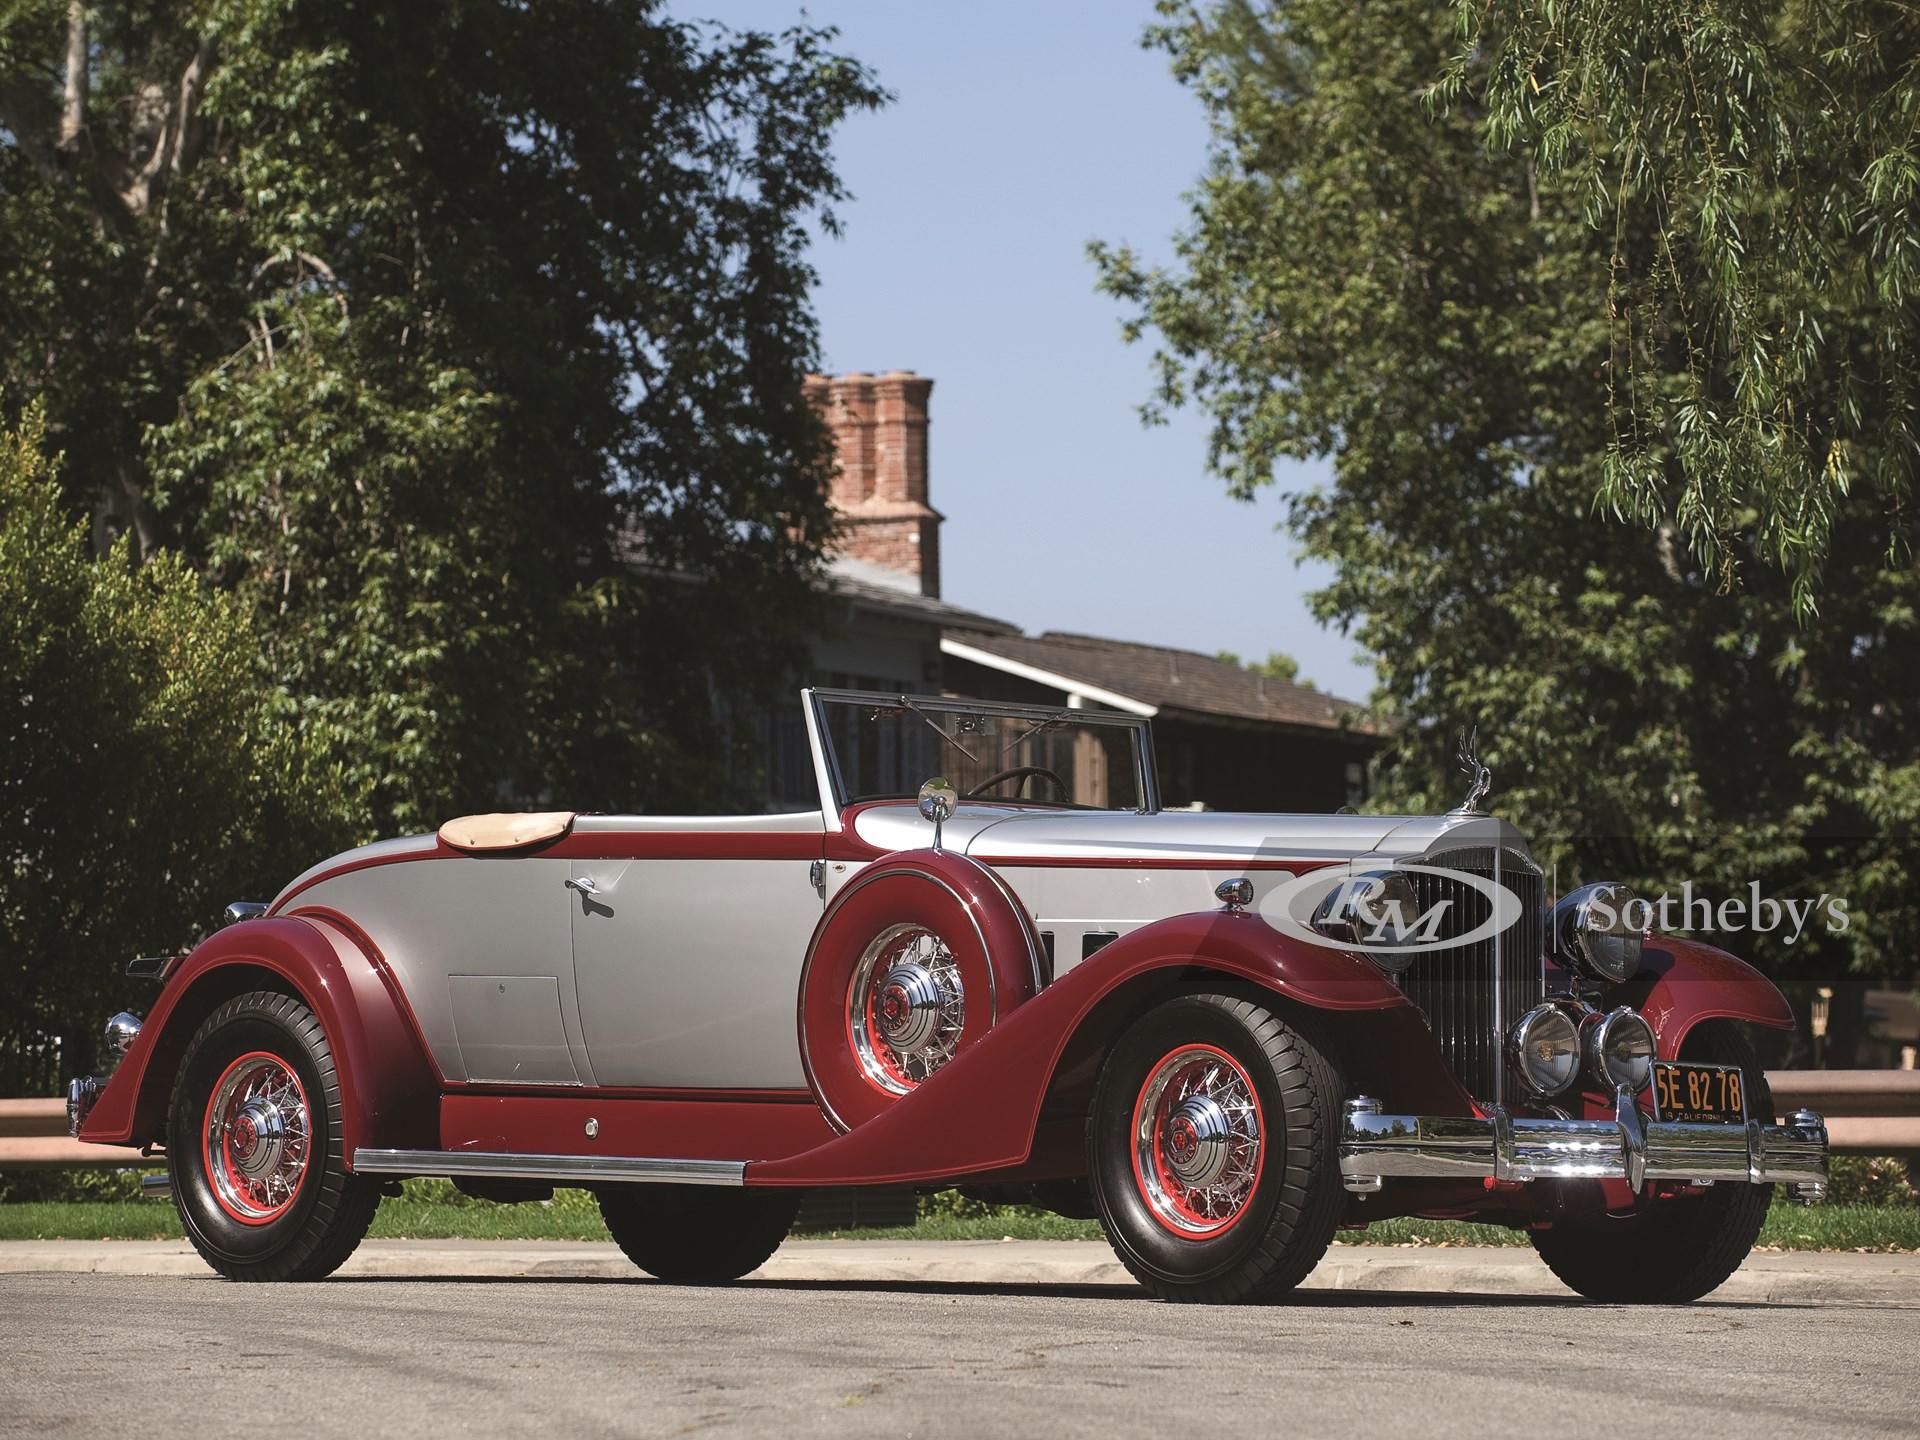 1933 Packard Twelve 2/4-Passenger Coupe Roadster